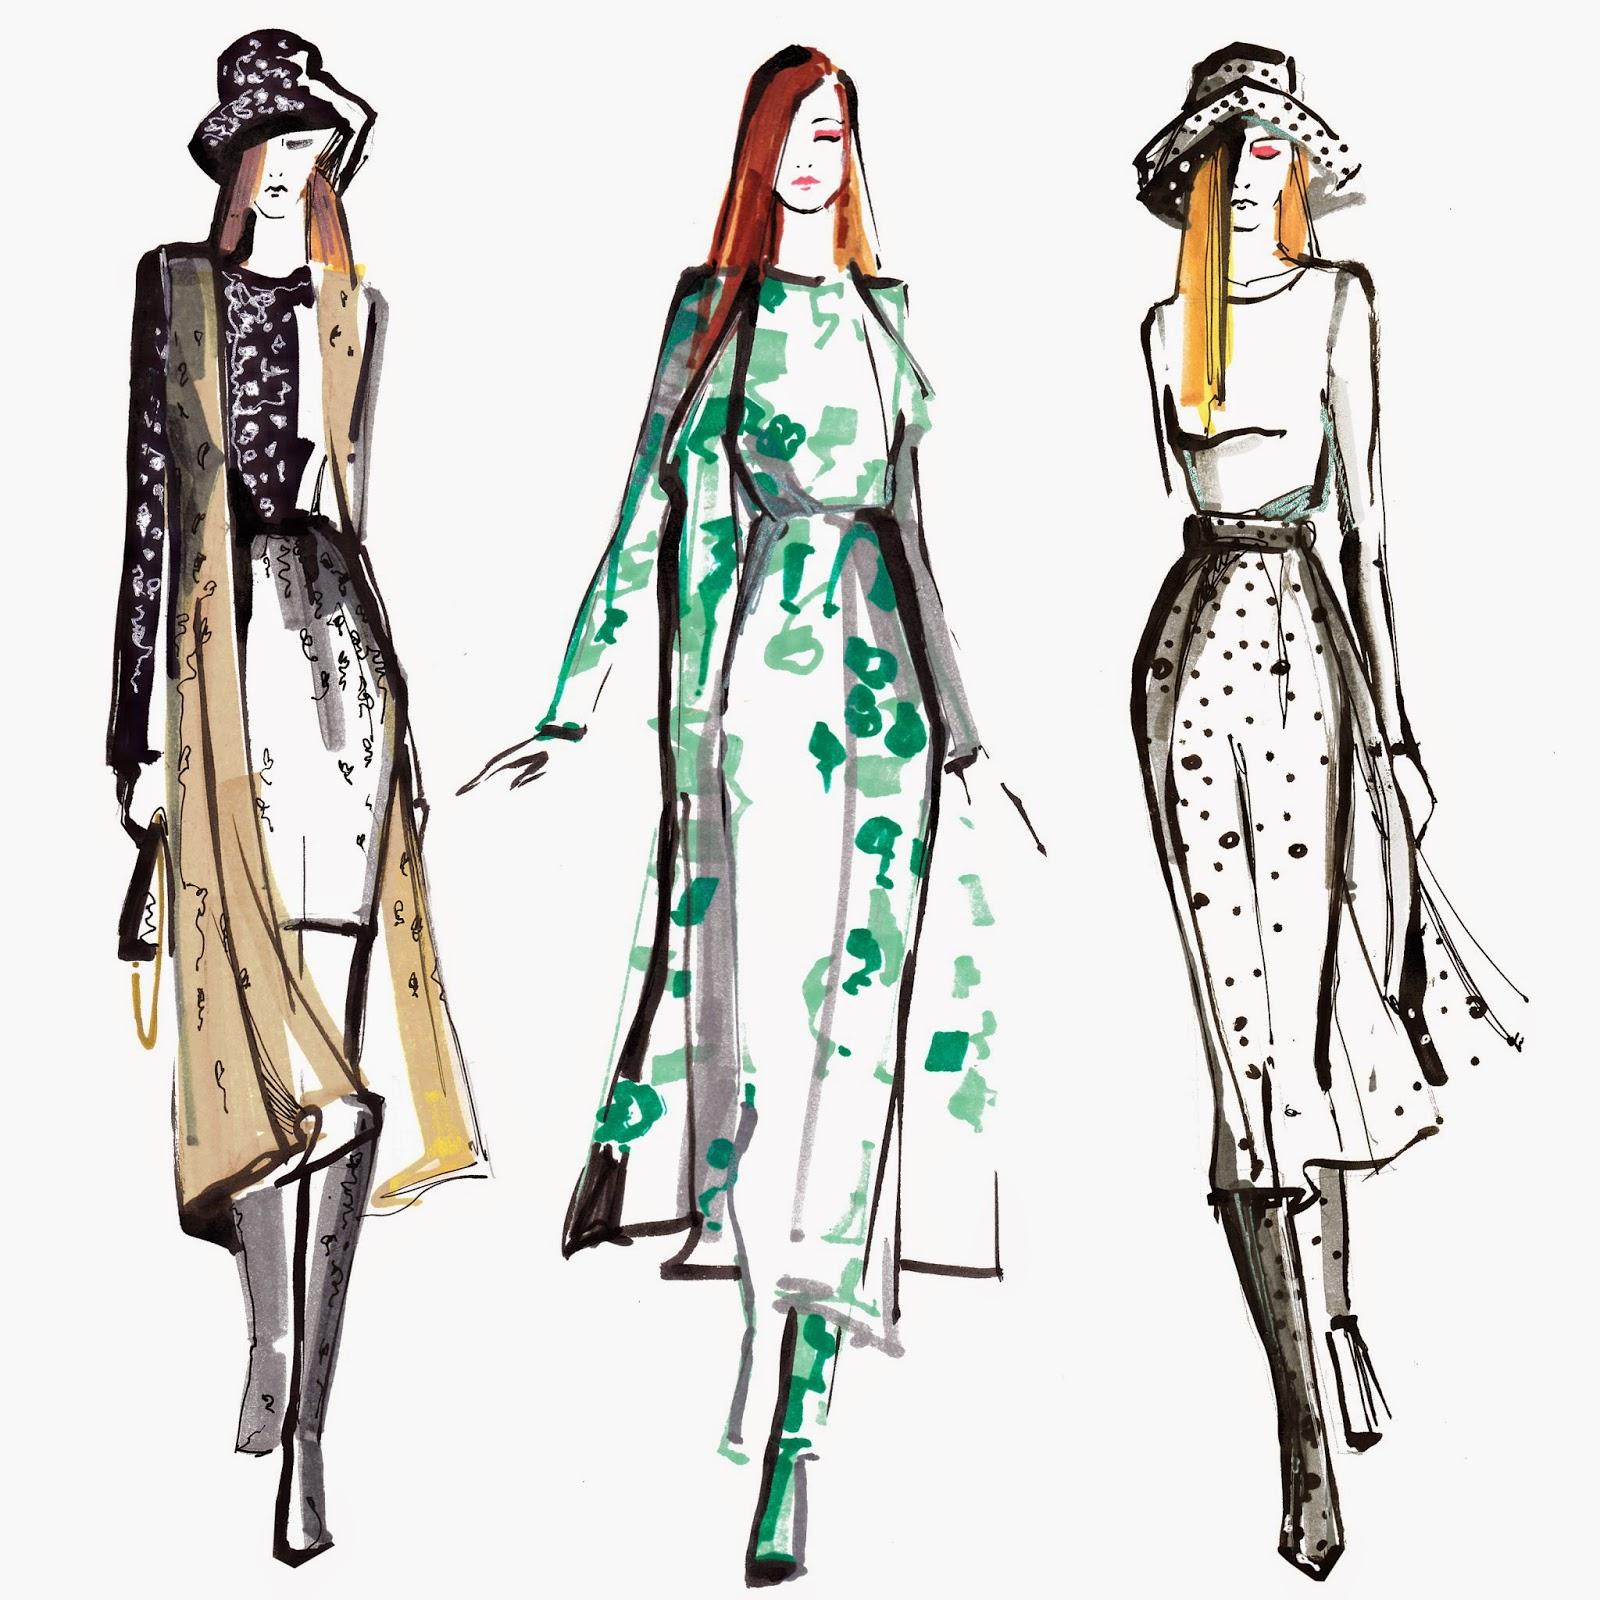 Sketching fashion for beginners Alexander Skarsgard Biography, News, Photos and